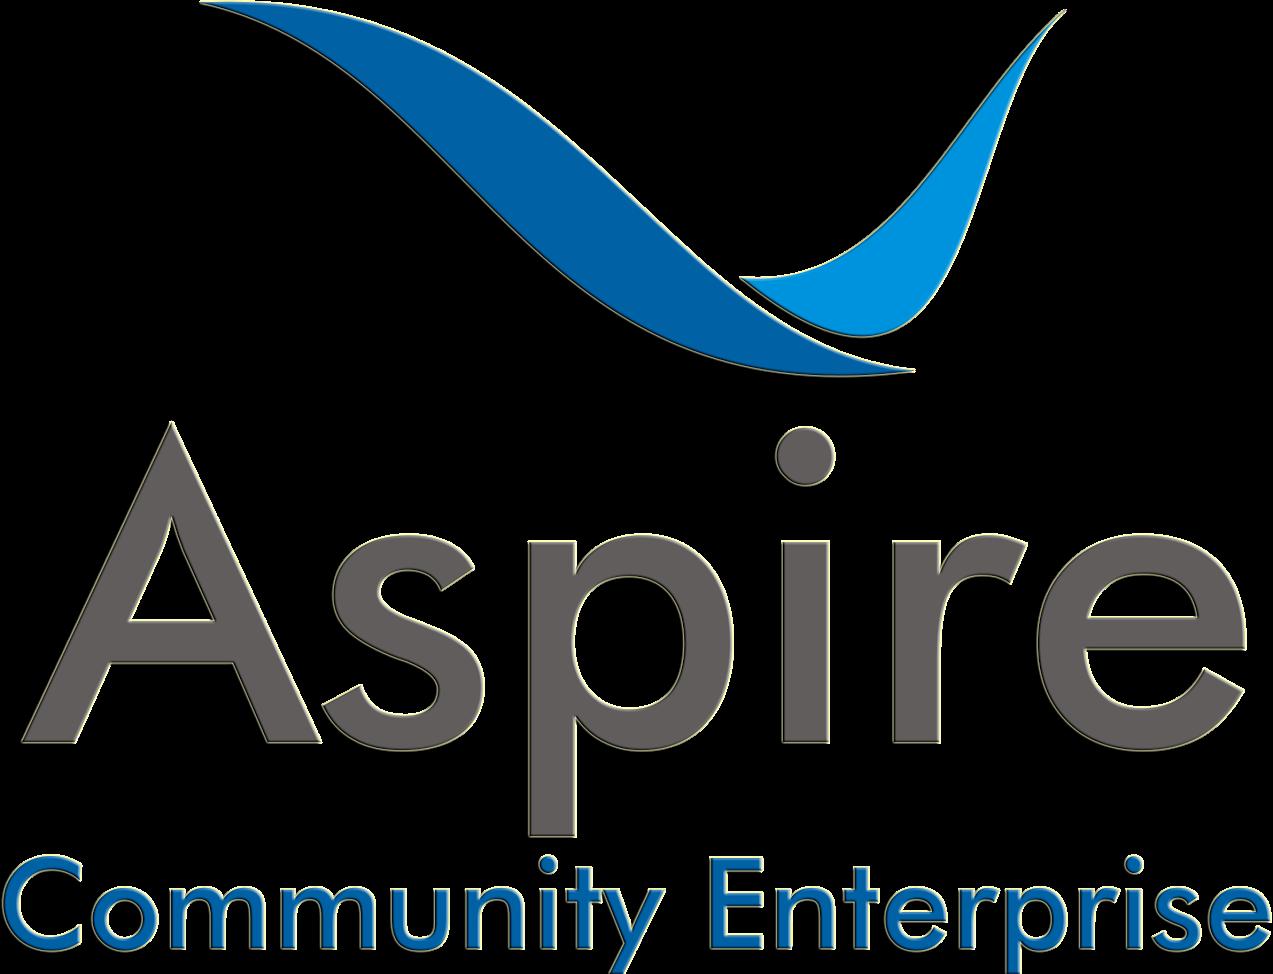 Aspire Community Enterprise Sheffield